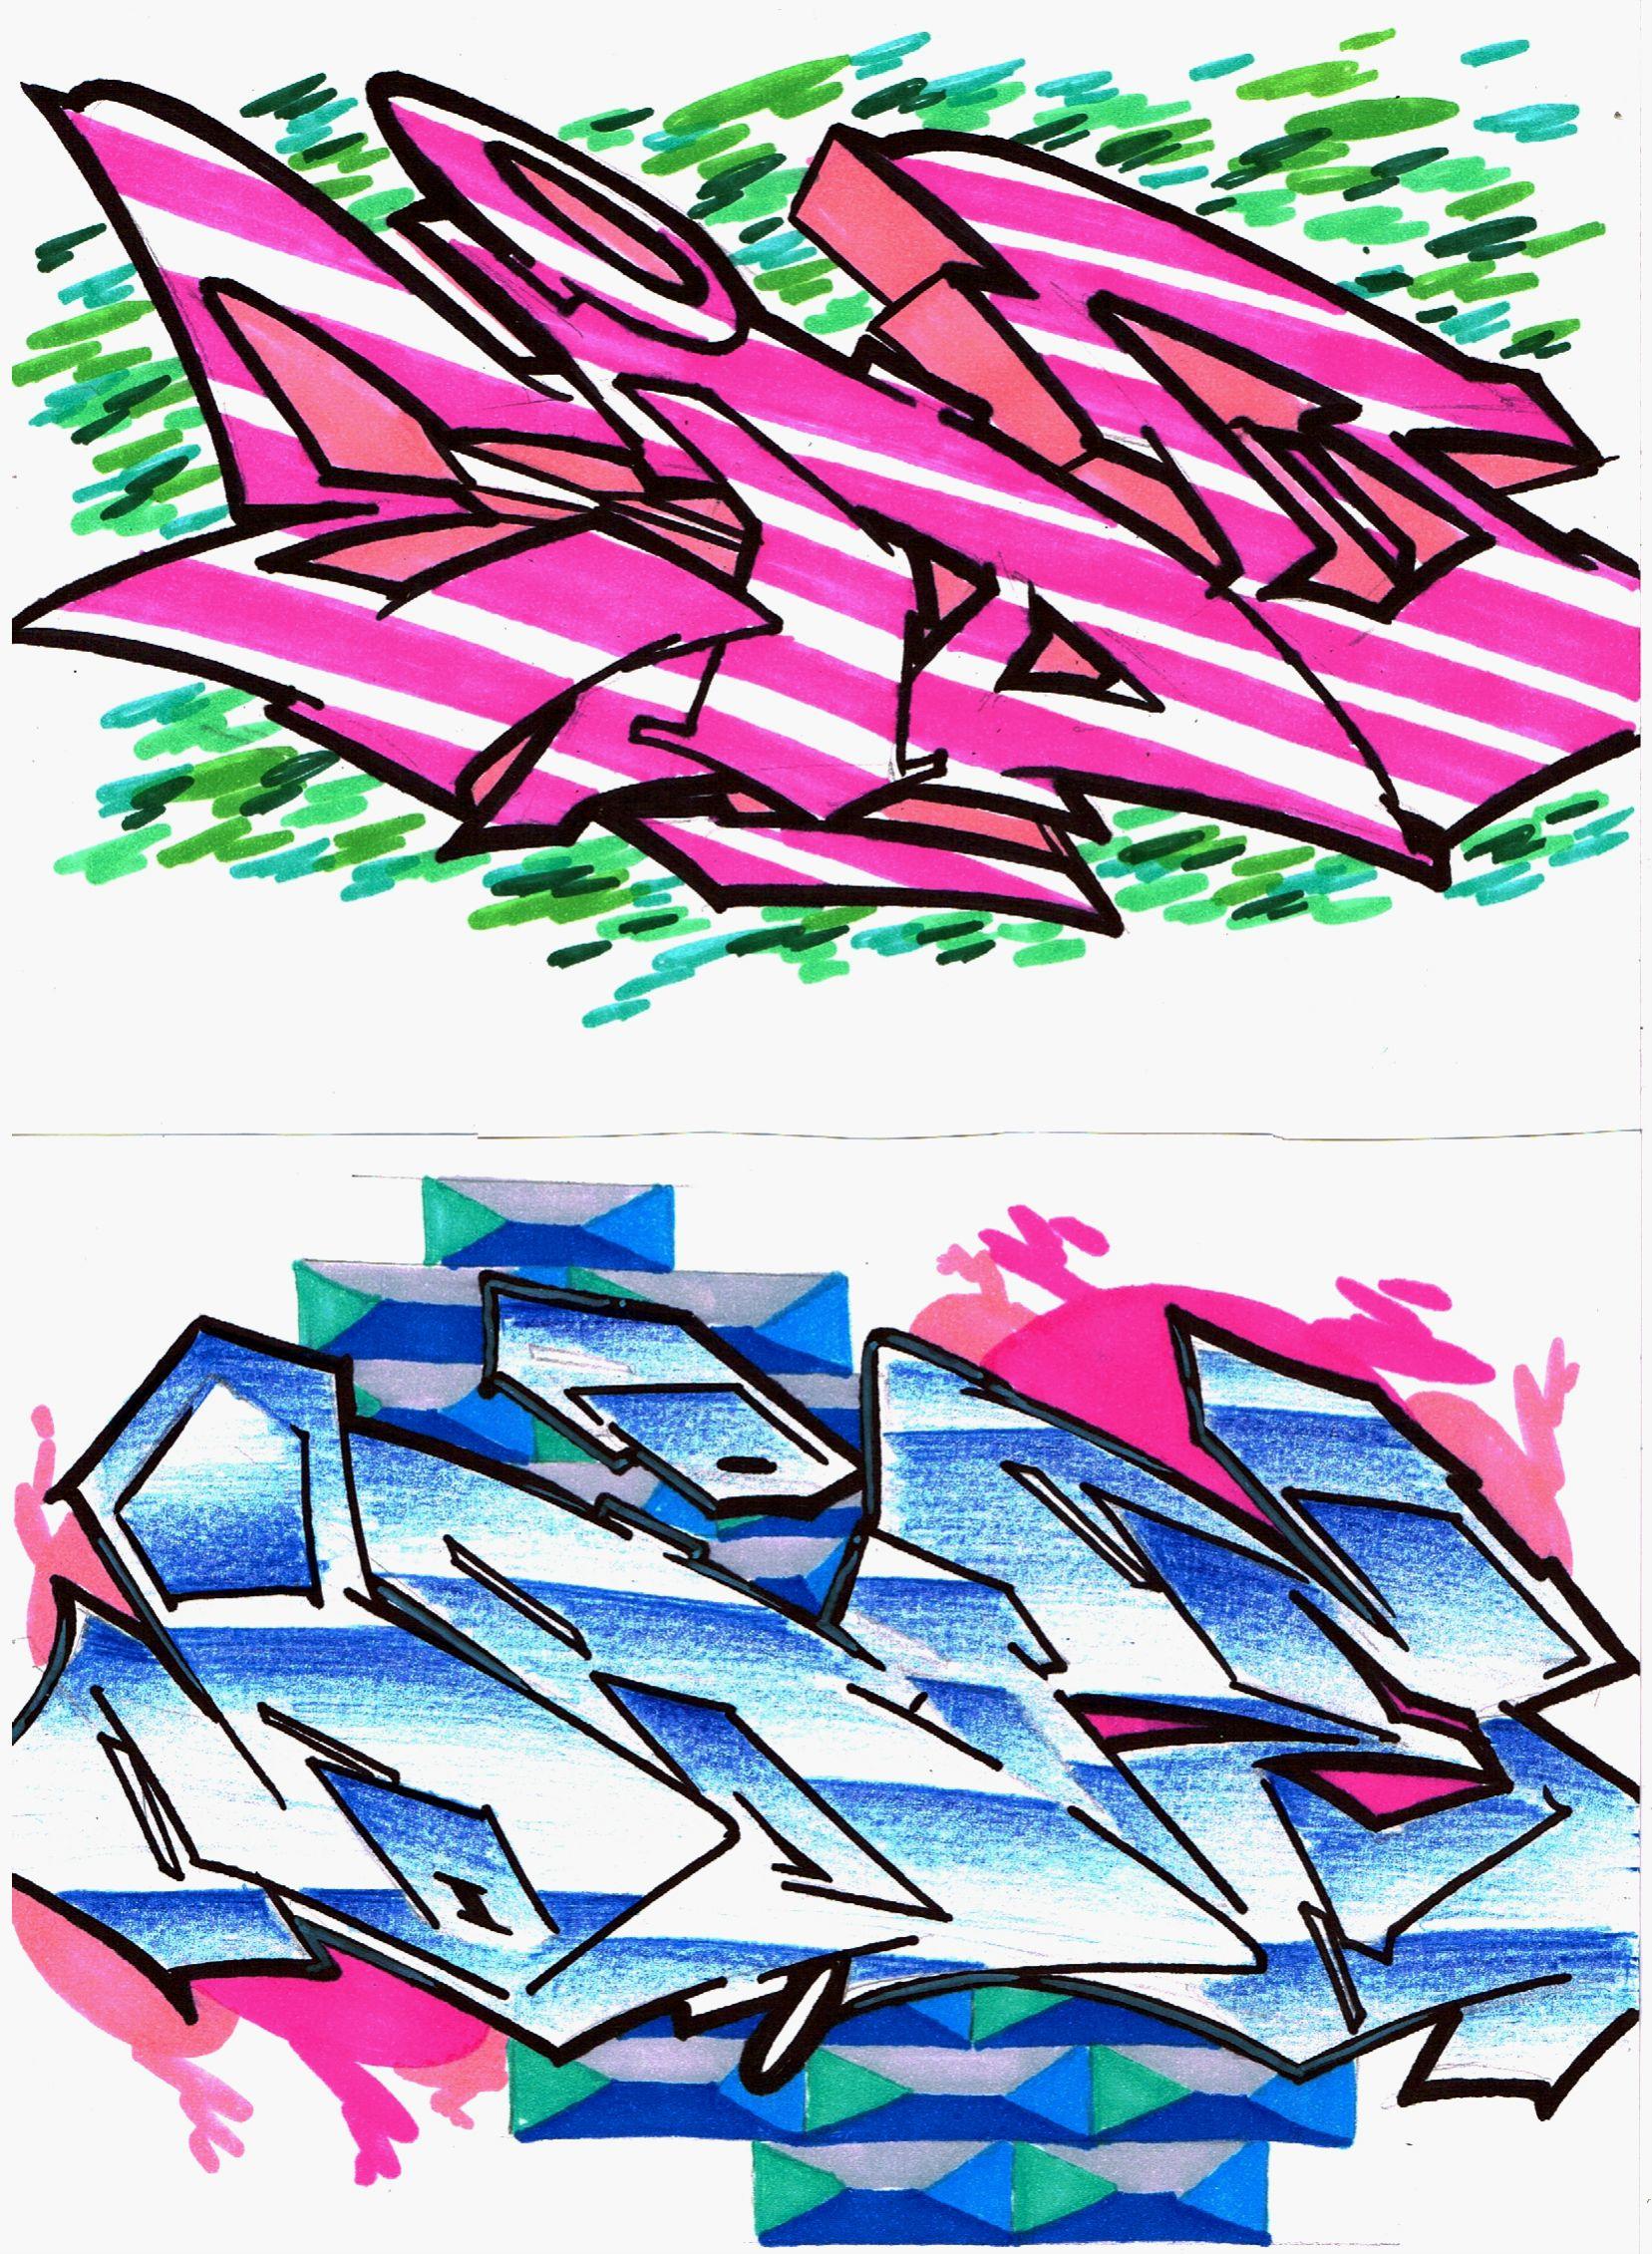 ai.imgur.com_LlI4nGe.jpg